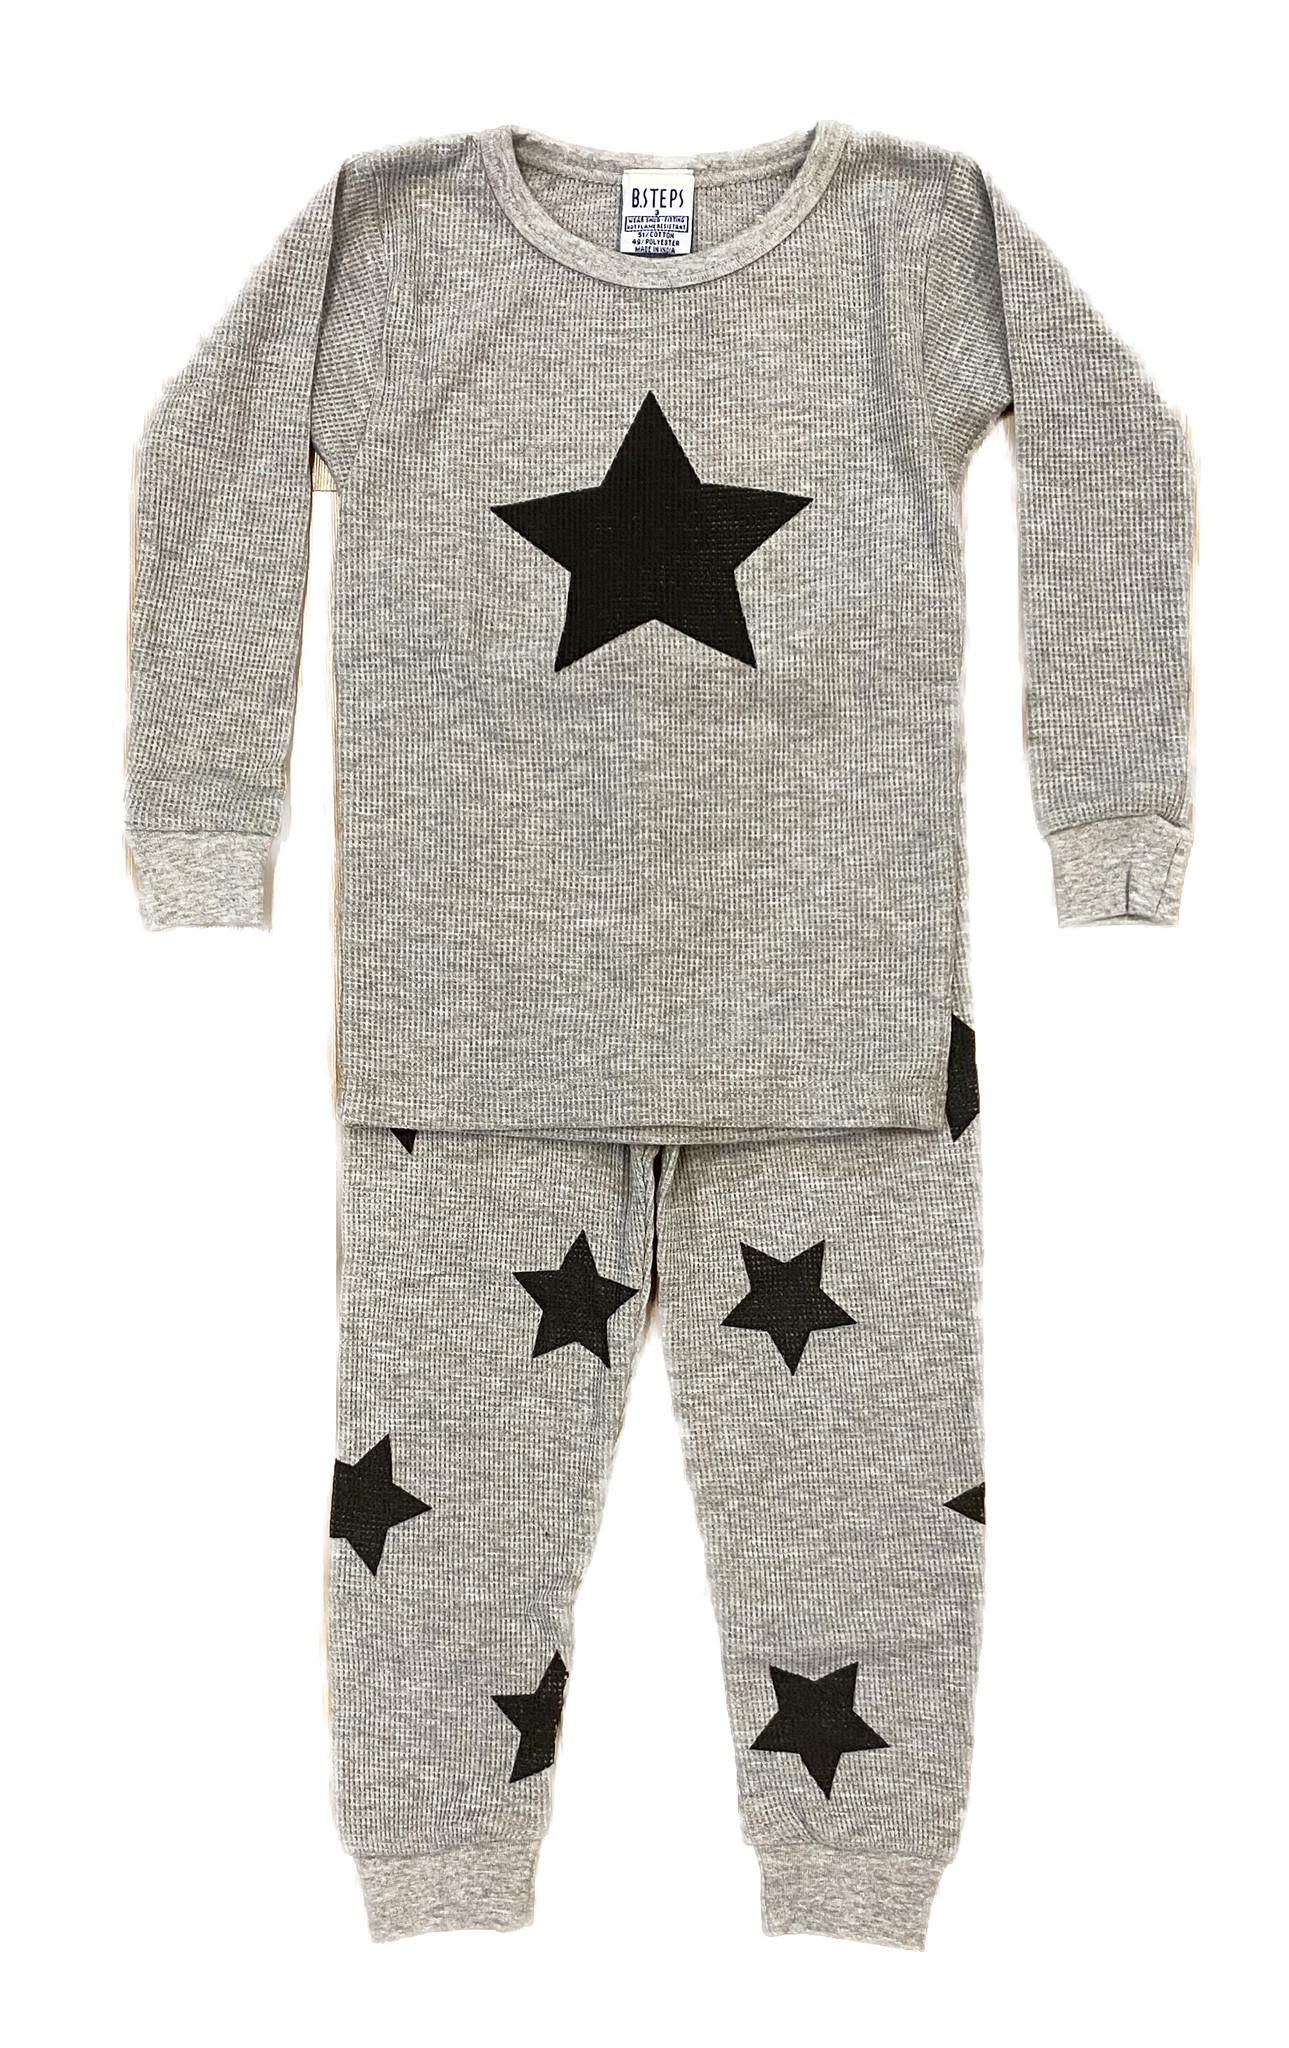 Baby Steps Heather Grey Star Thermal Infant PJ Set